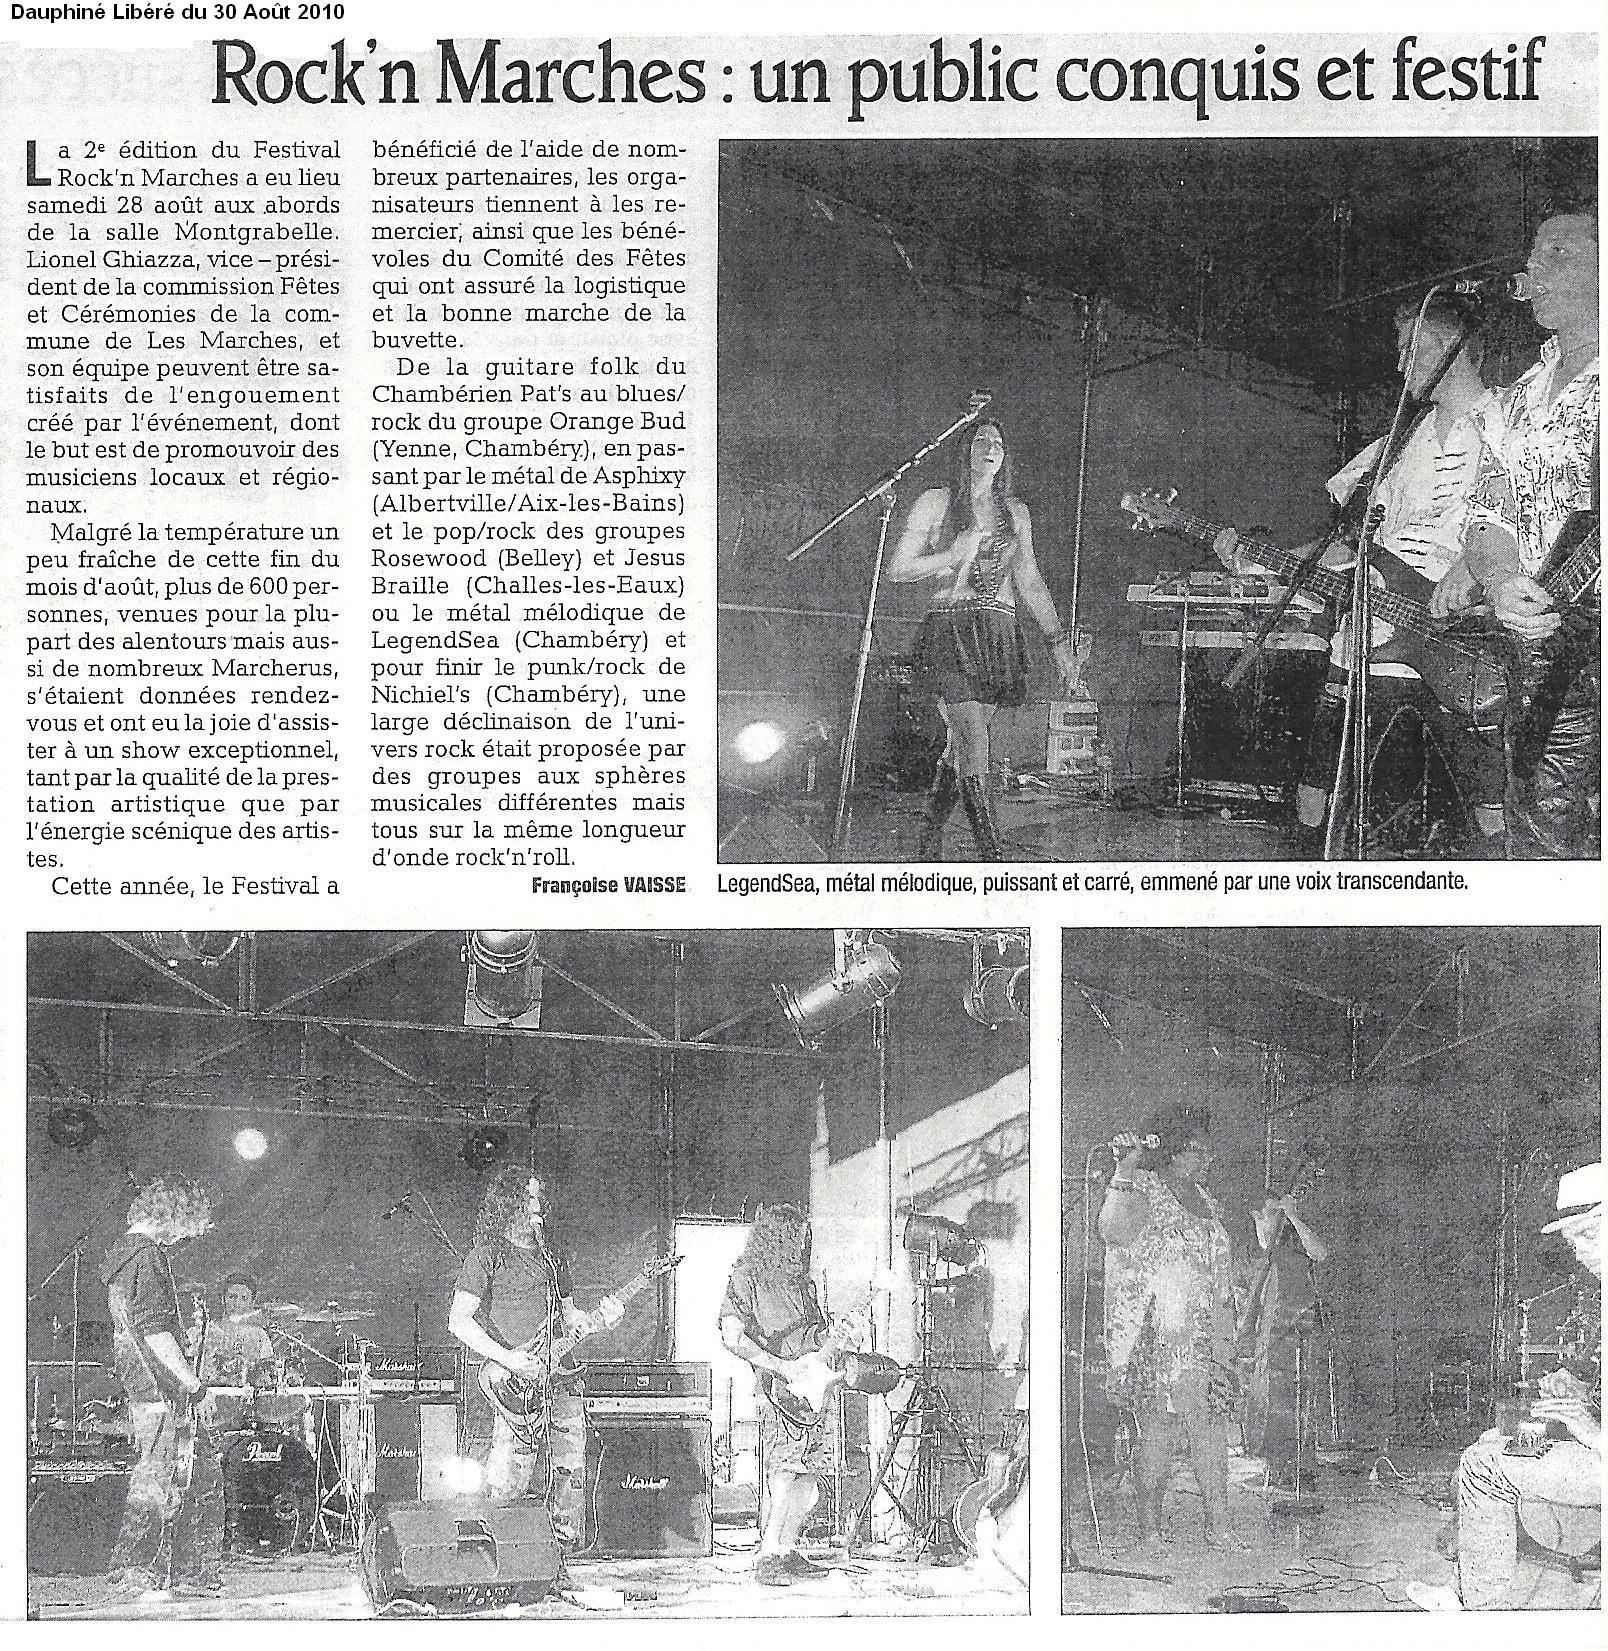 article DL_2010-08-30_V2.jpg